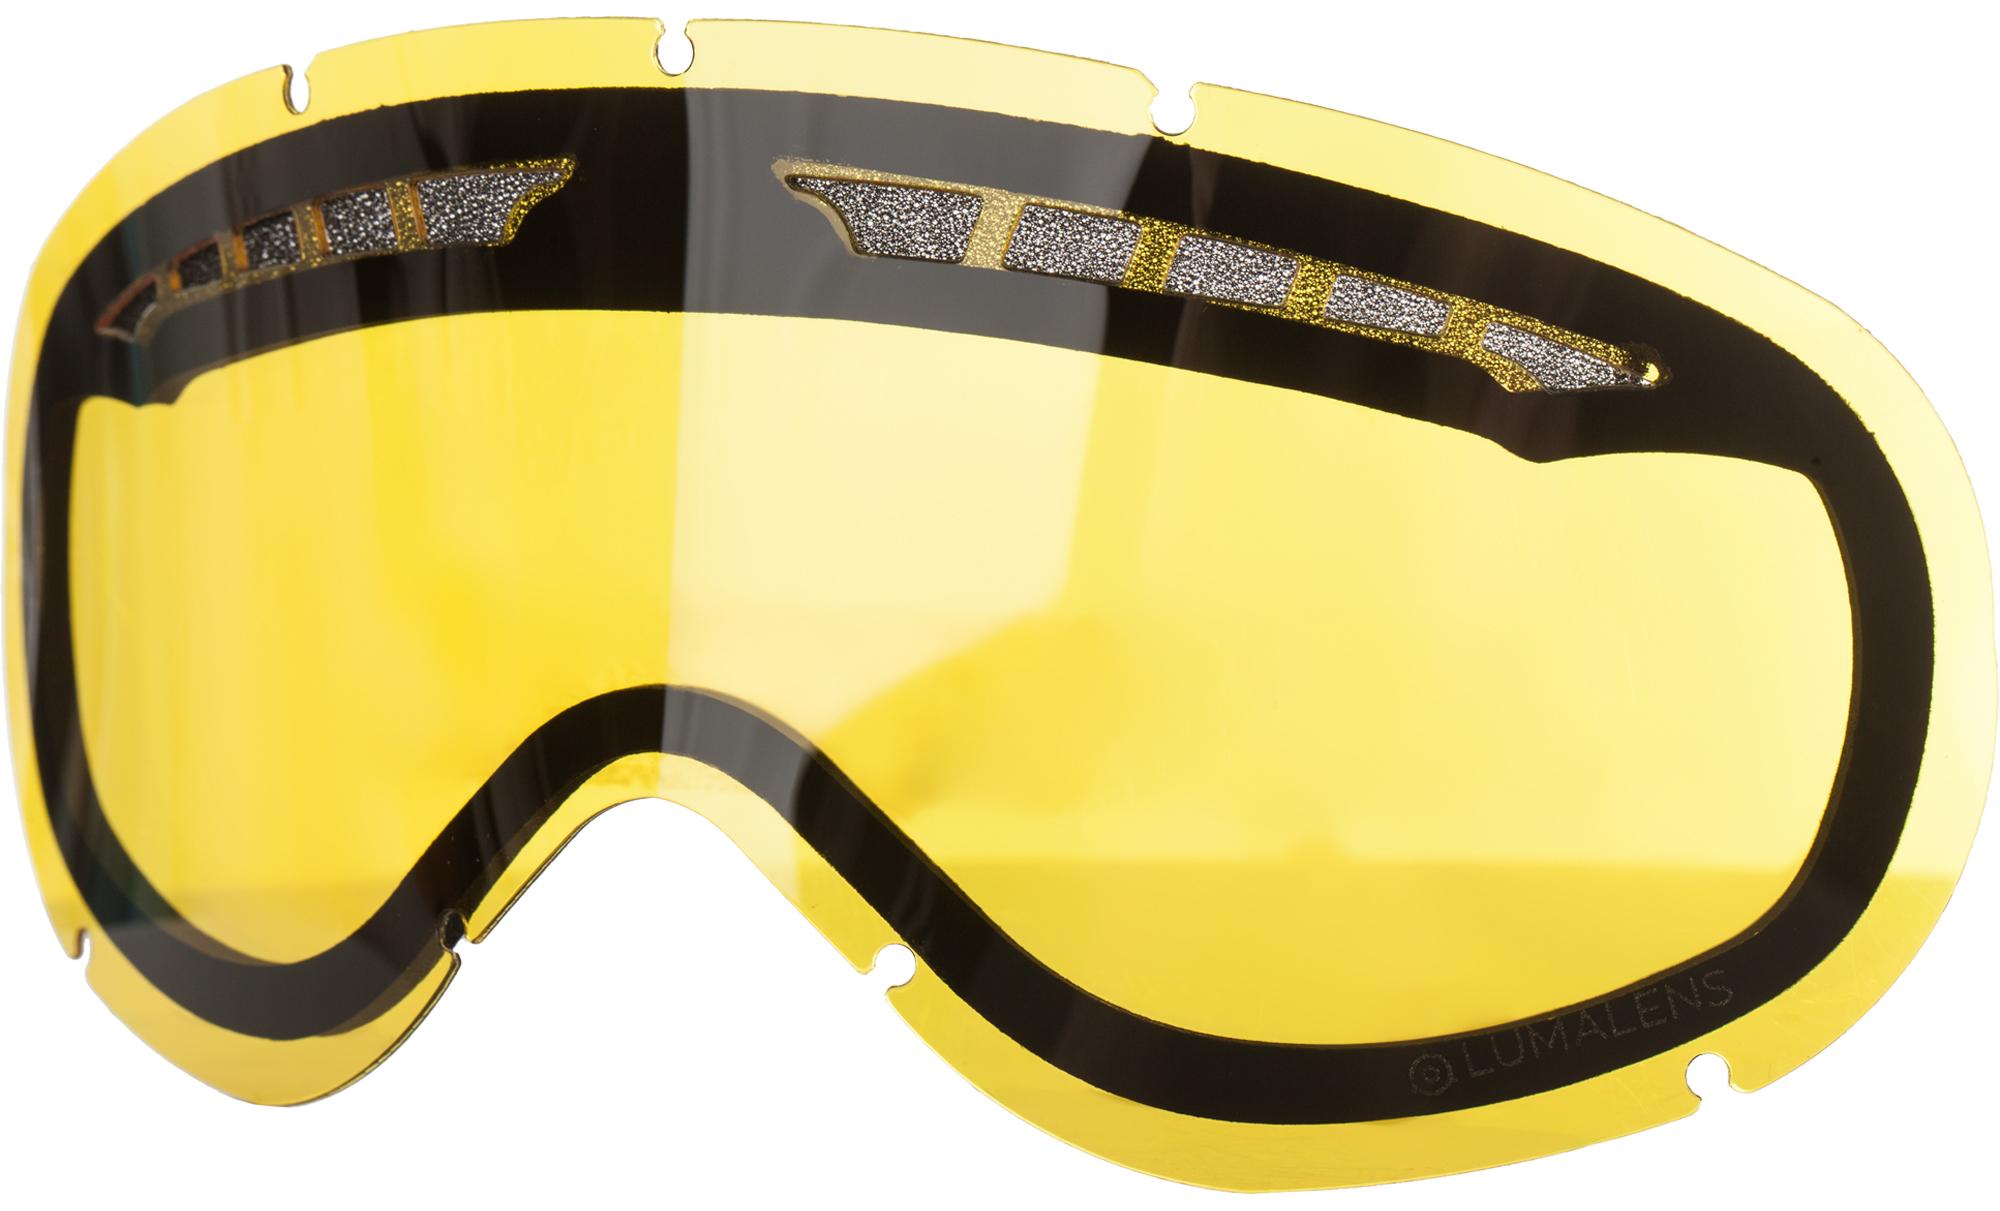 Dragon Линза для маски Dragon DX RPL LENS - Lumalens Yellow линза для маски мото вело oakley half jacket xlj repl lens kit black iridium